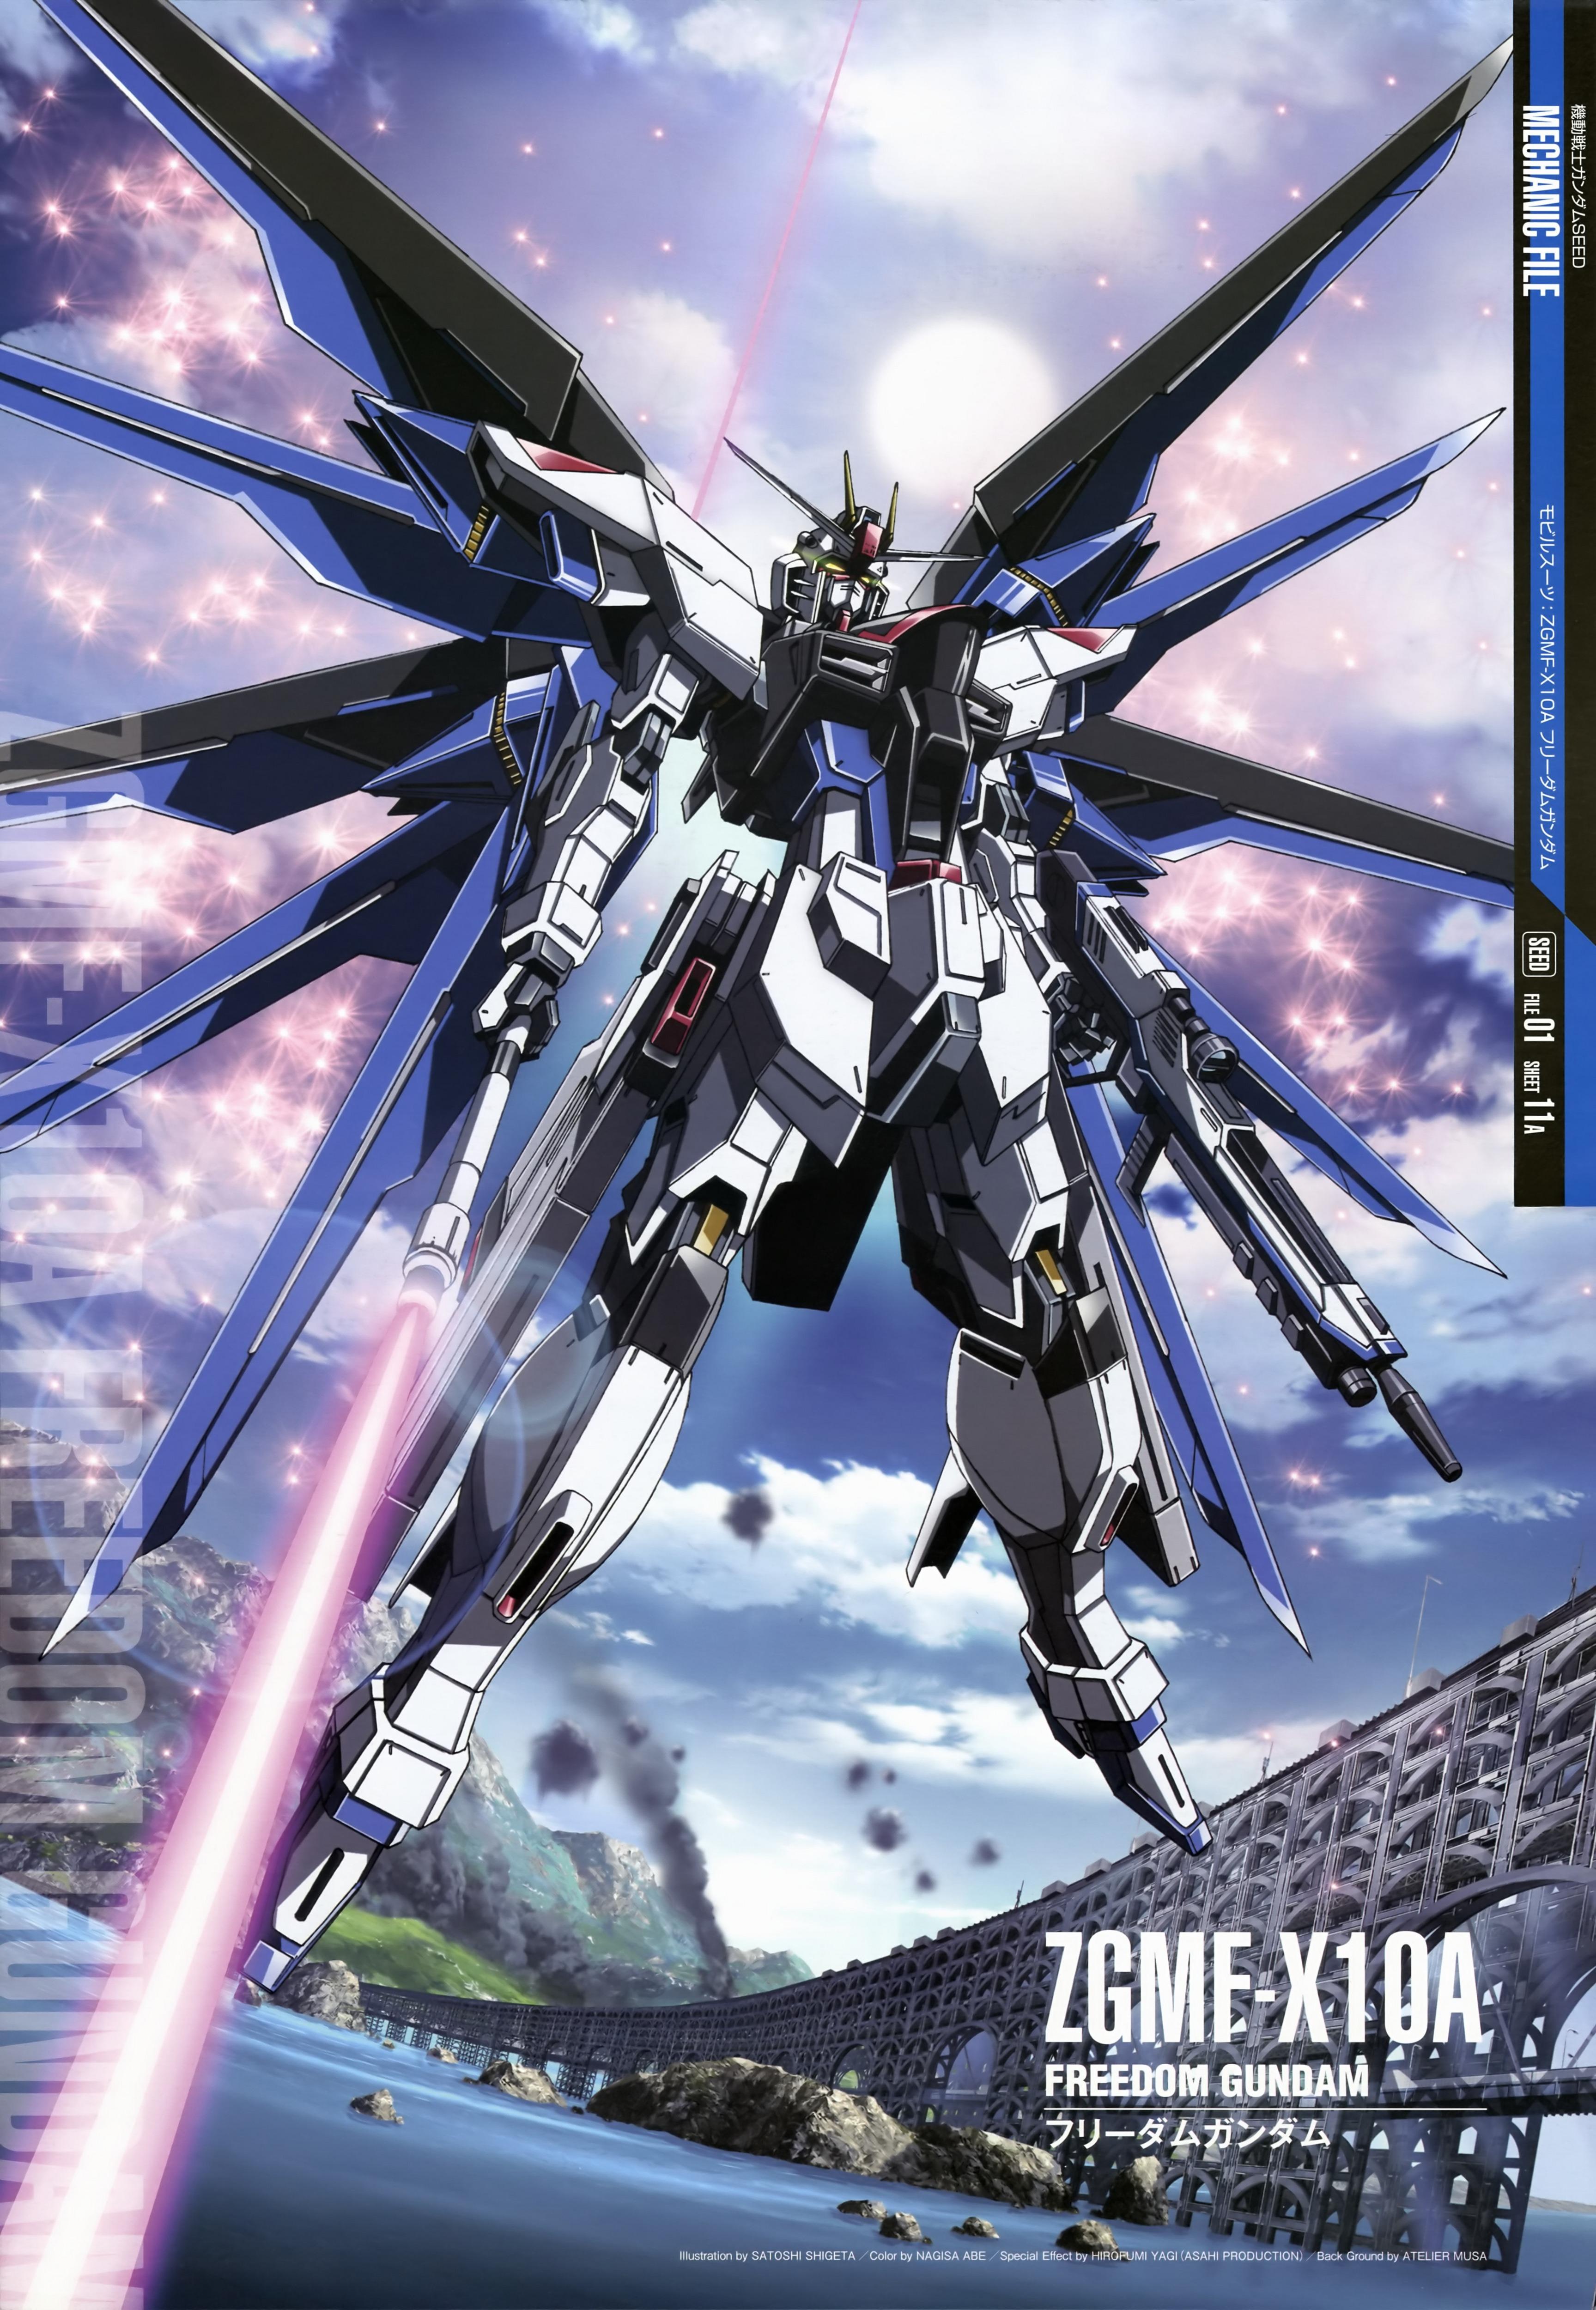 Free download Freedom Gundam Gundam Seed Photo 34040582 [3455x5000